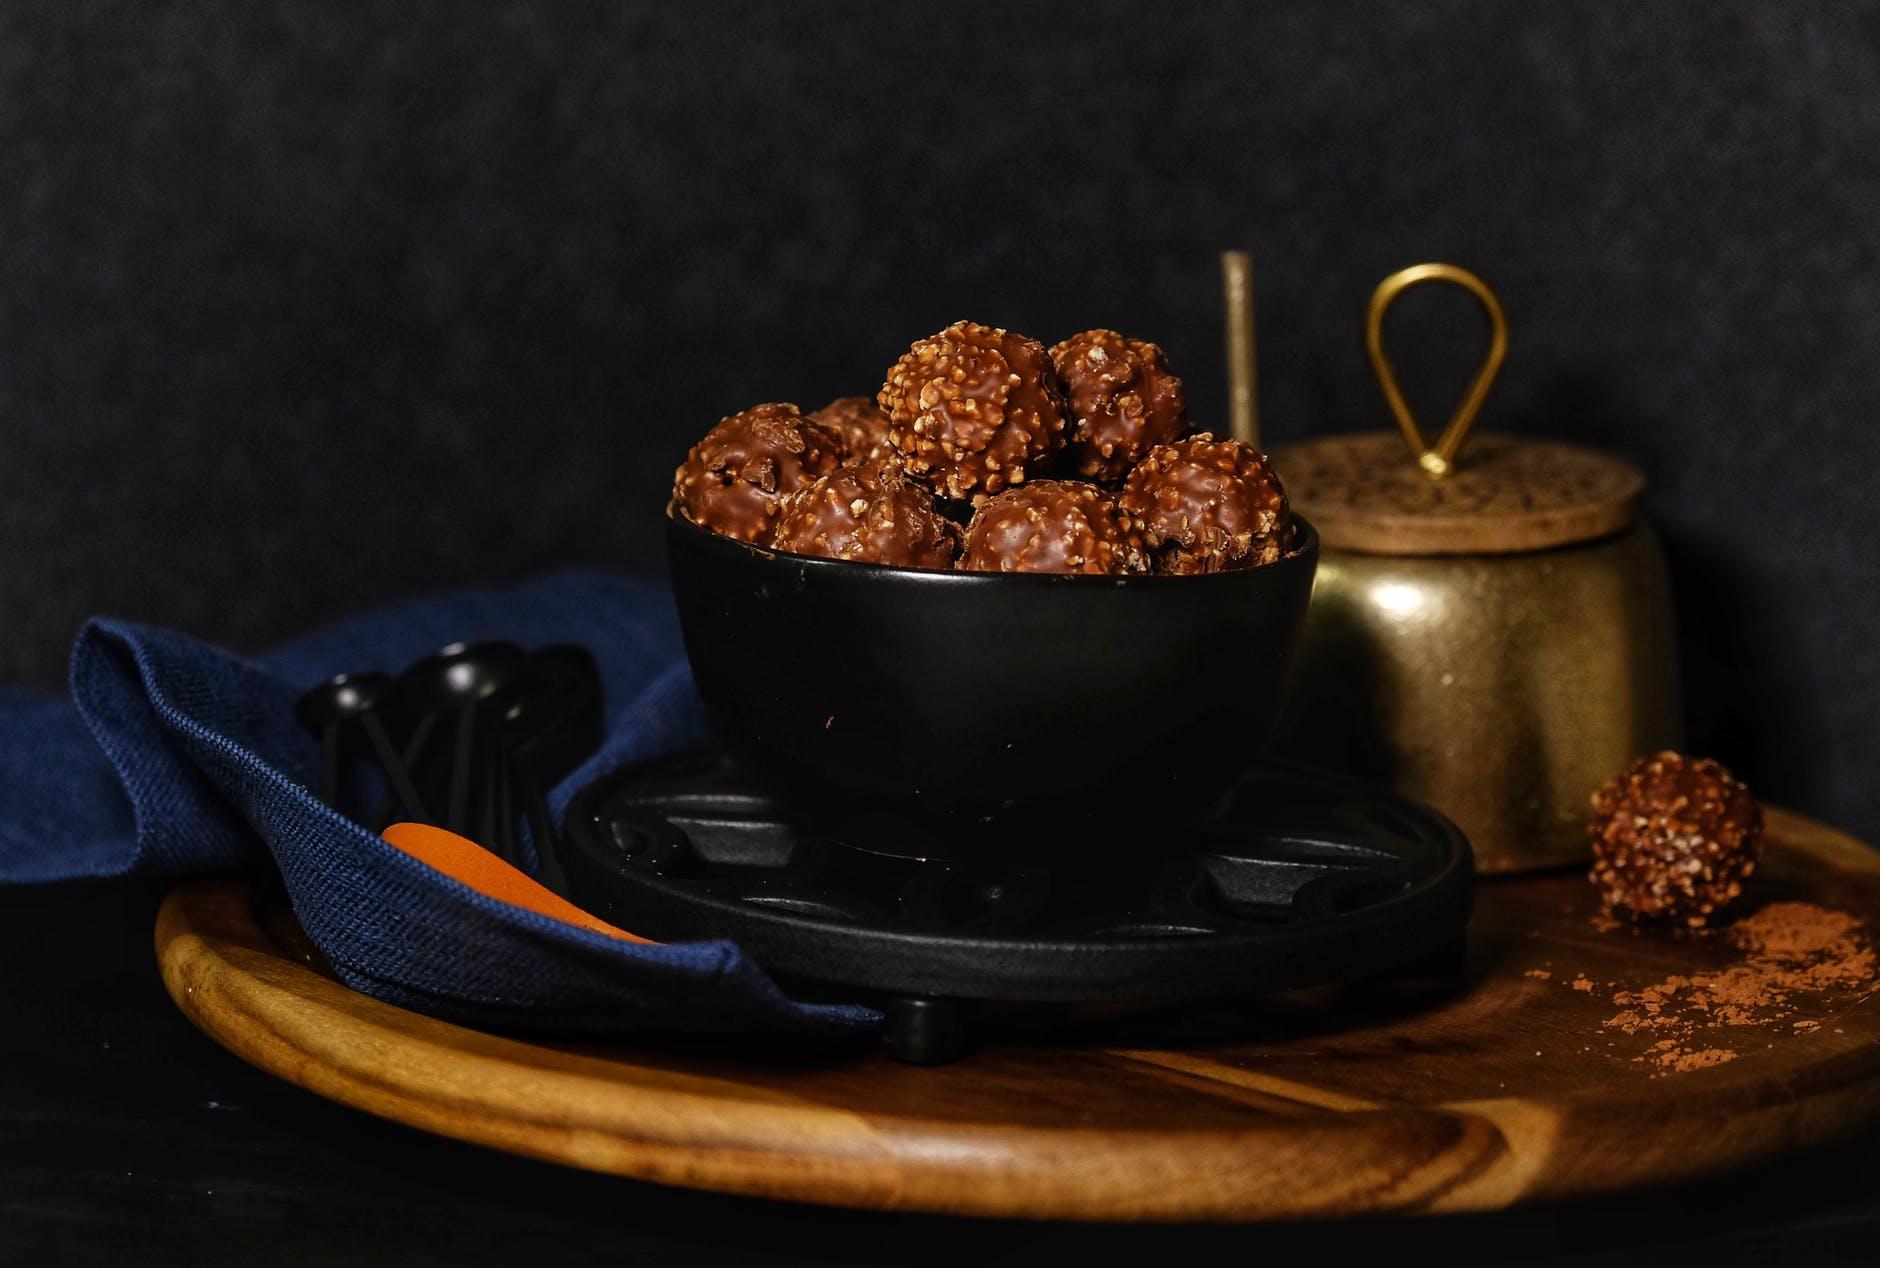 chocolate on a black bowl